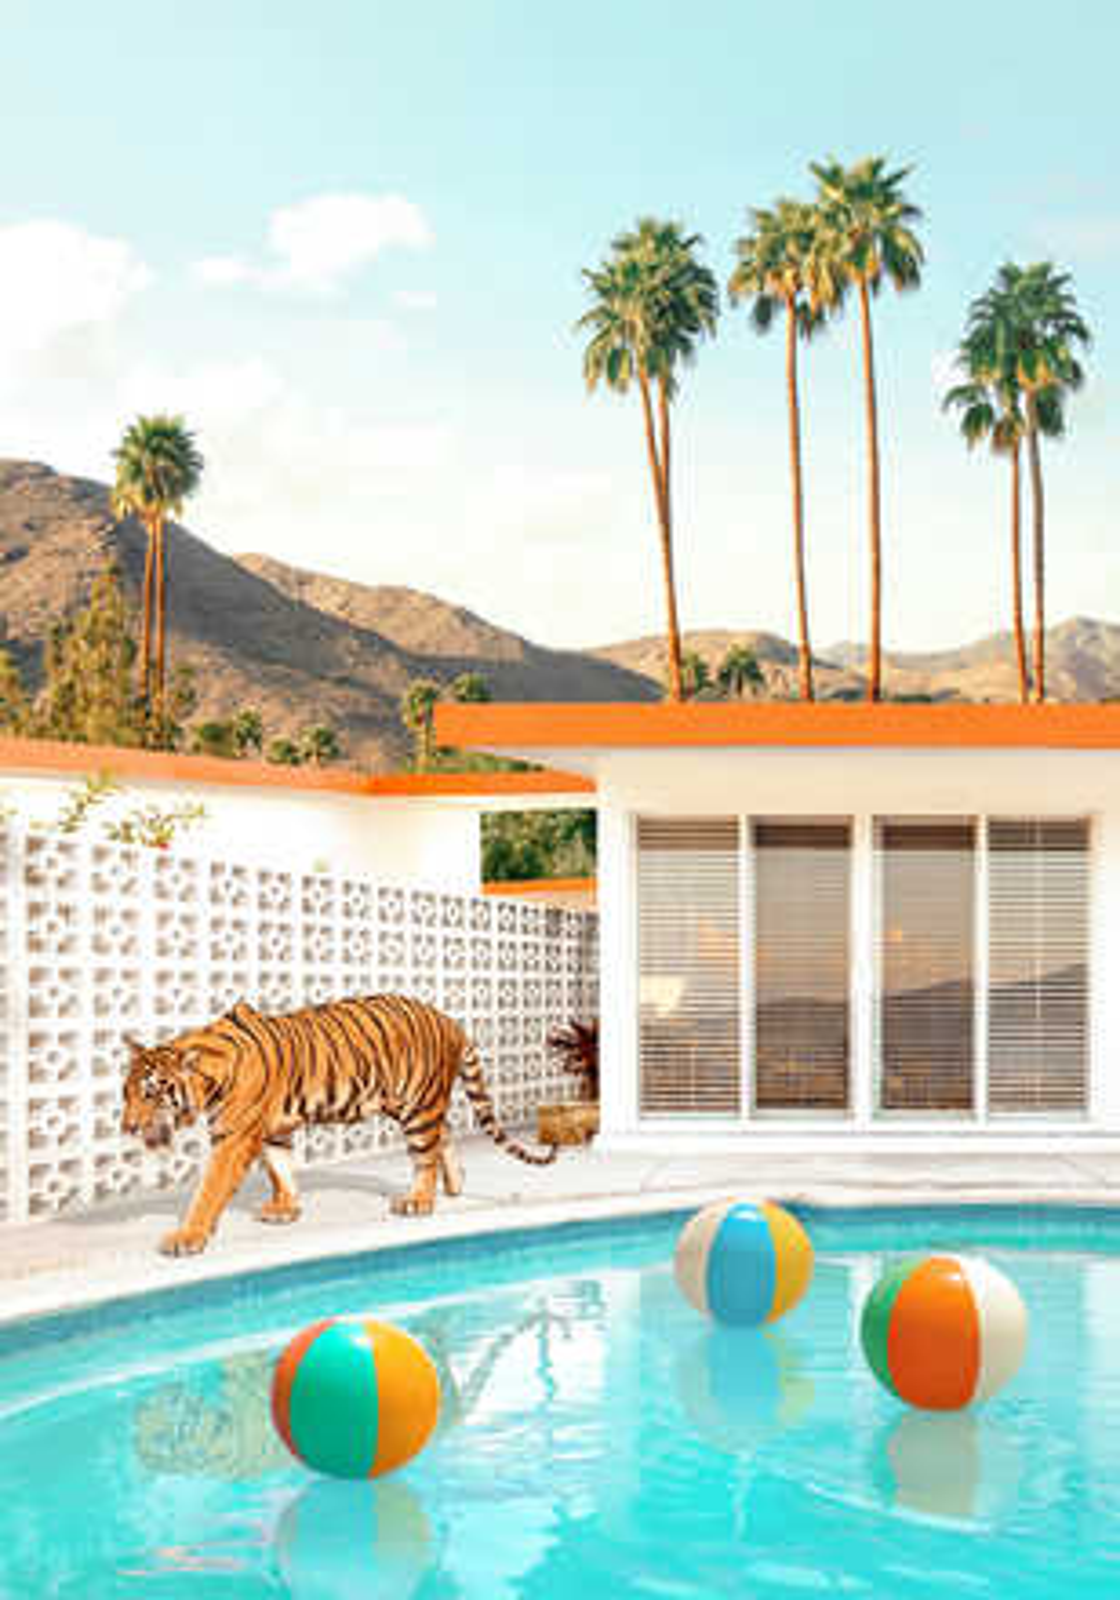 Pool Desert Tiger - Paul Fuentes